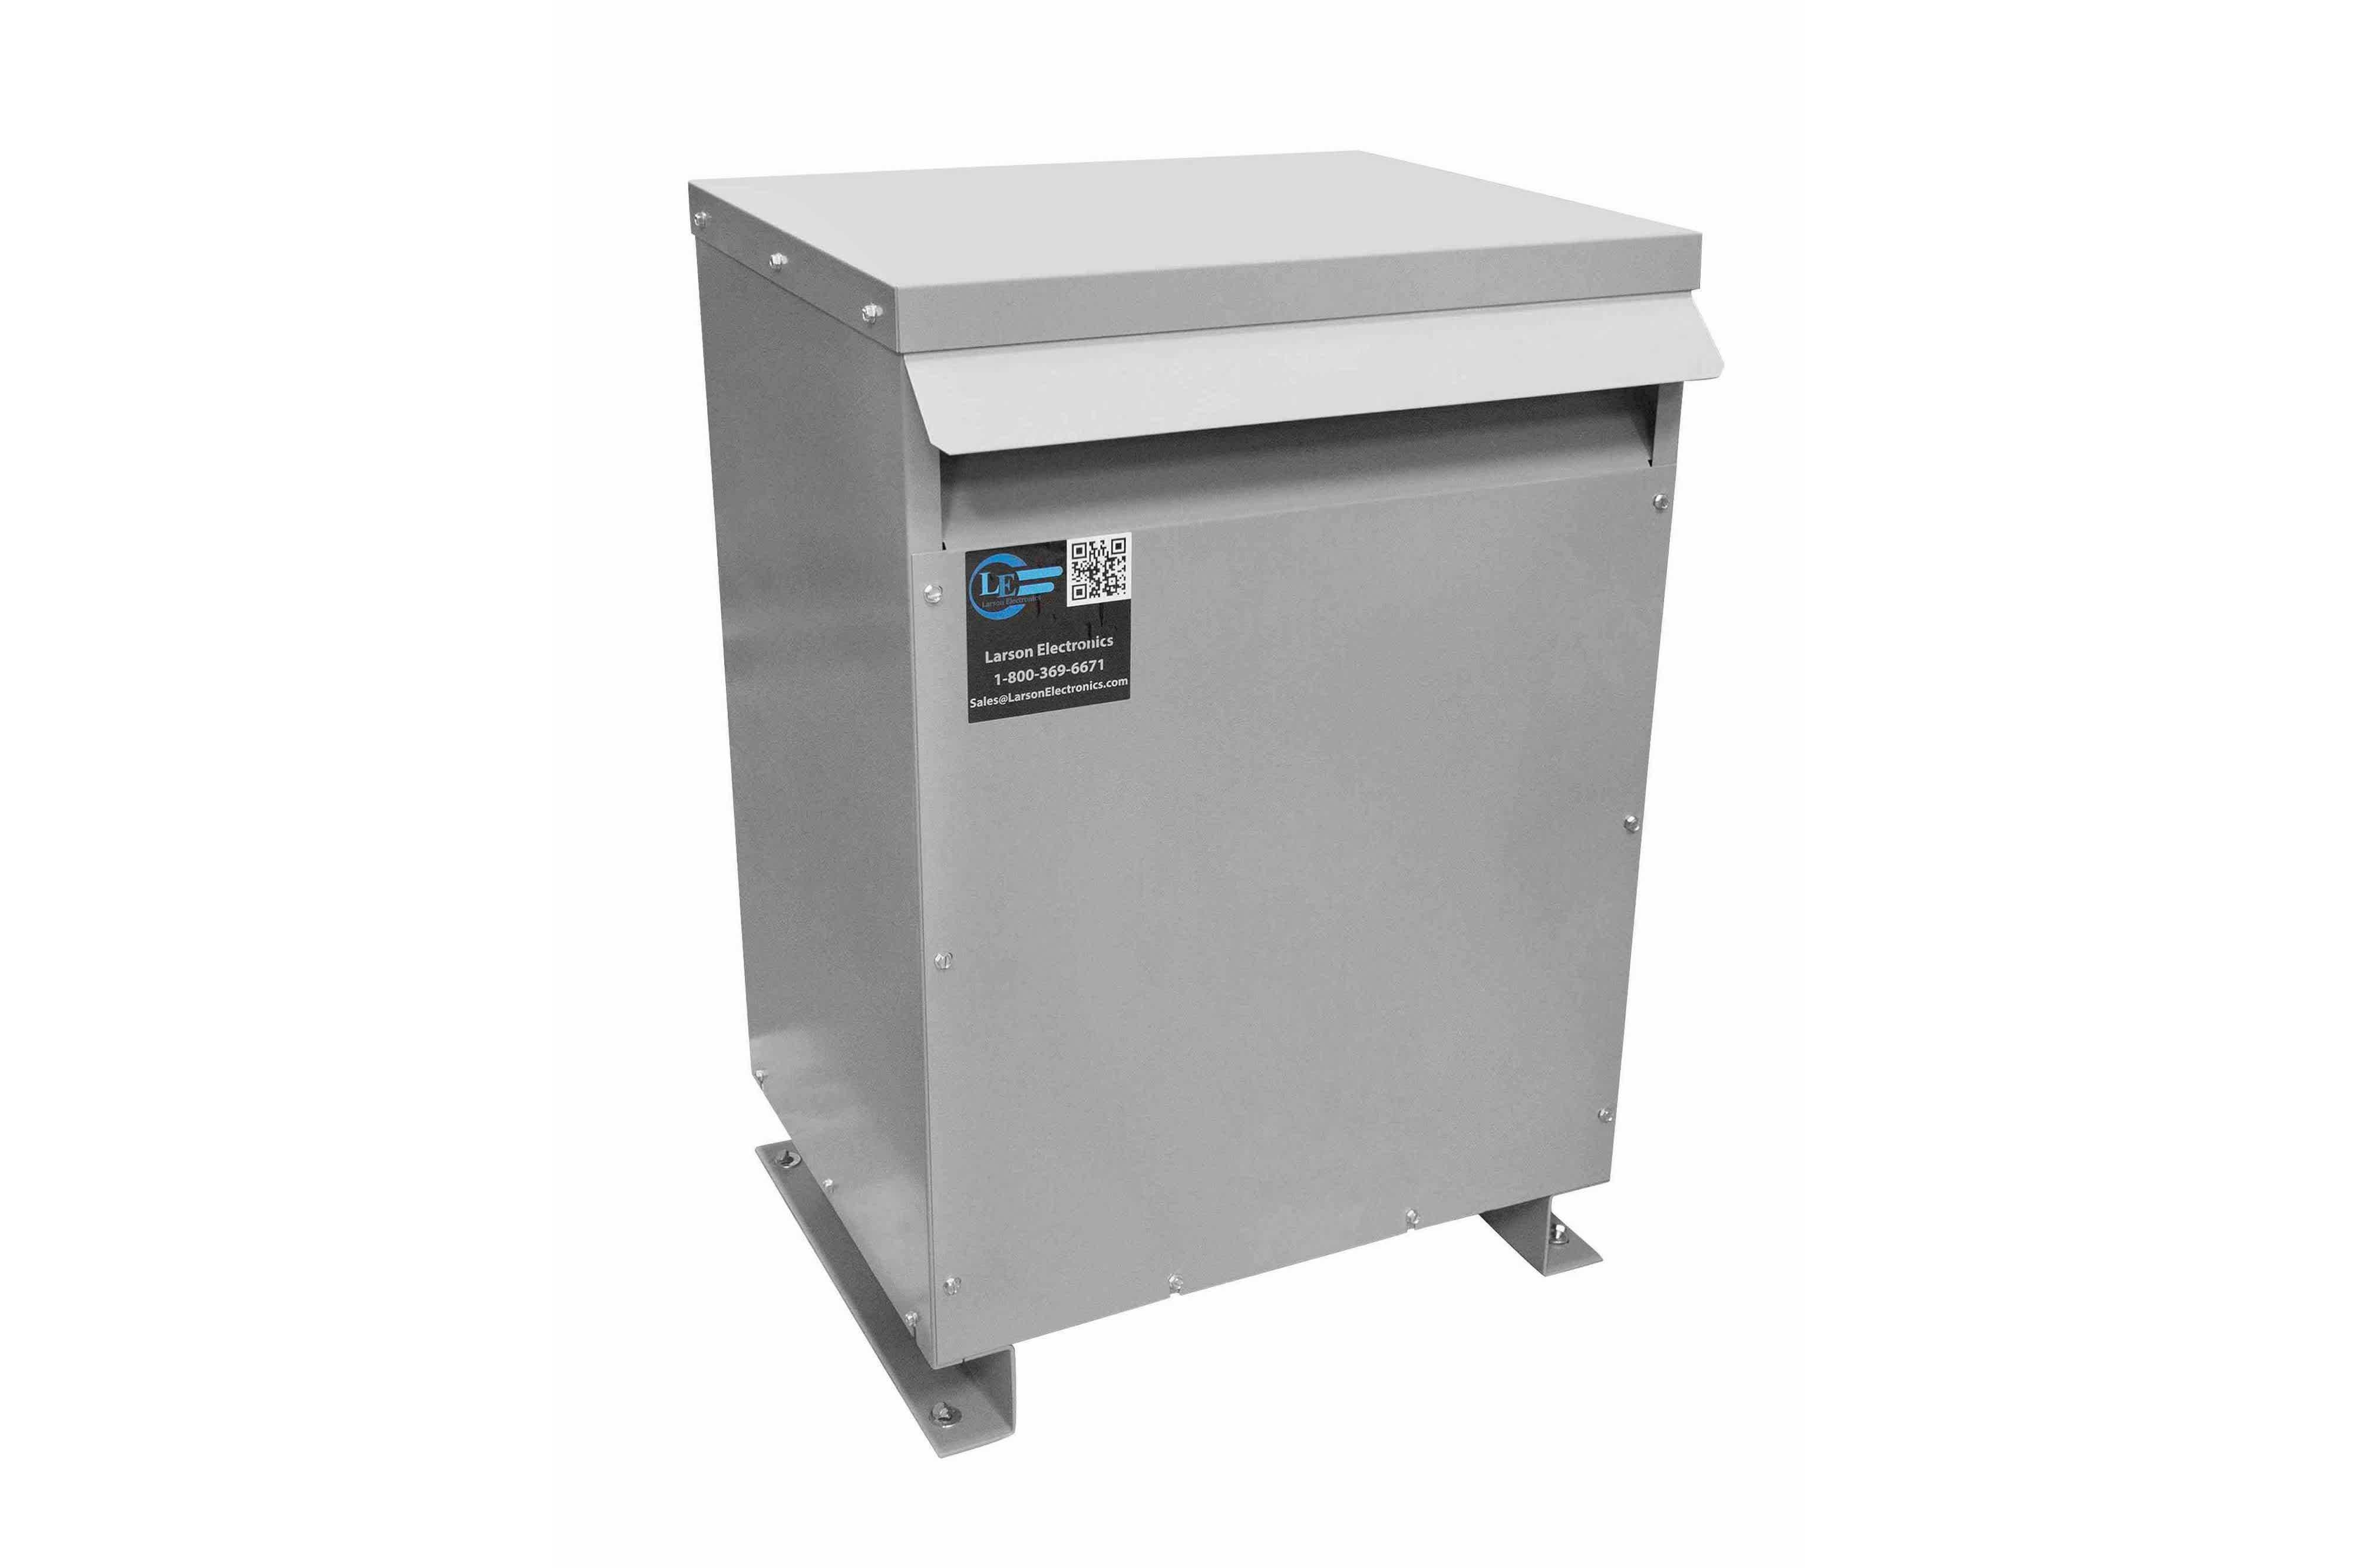 500 kVA 3PH Isolation Transformer, 480V Wye Primary, 208Y/120 Wye-N Secondary, N3R, Ventilated, 60 Hz